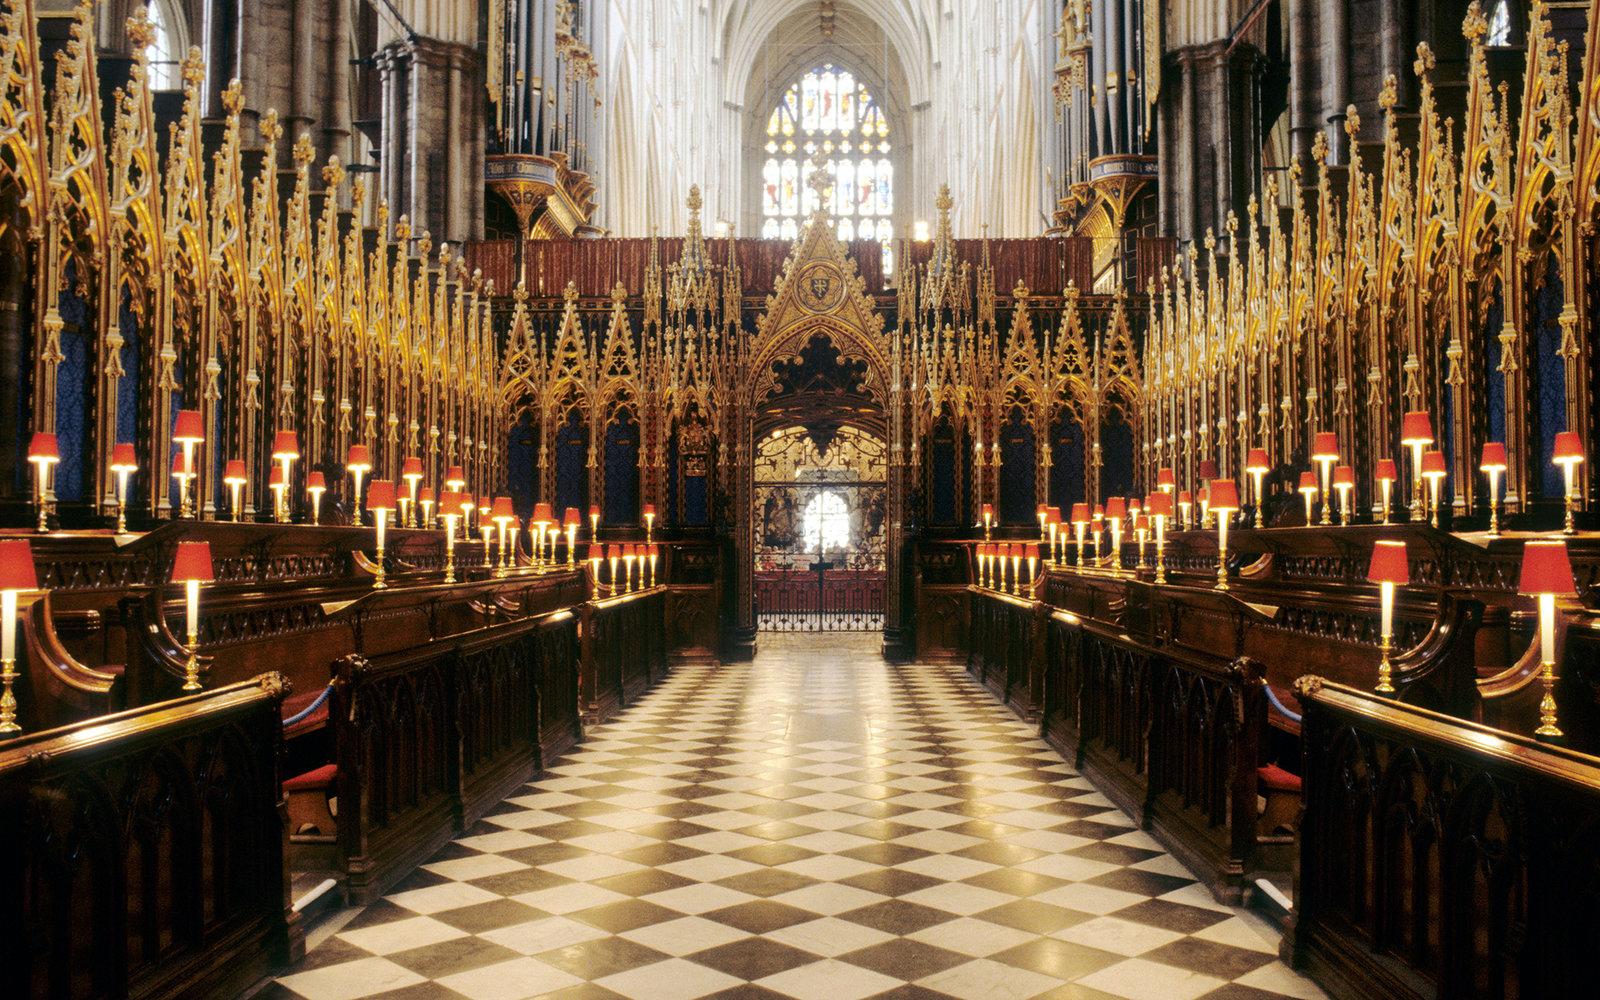 Paul George Wallpaper Hd Westminster Abbey Church London United Kingdom